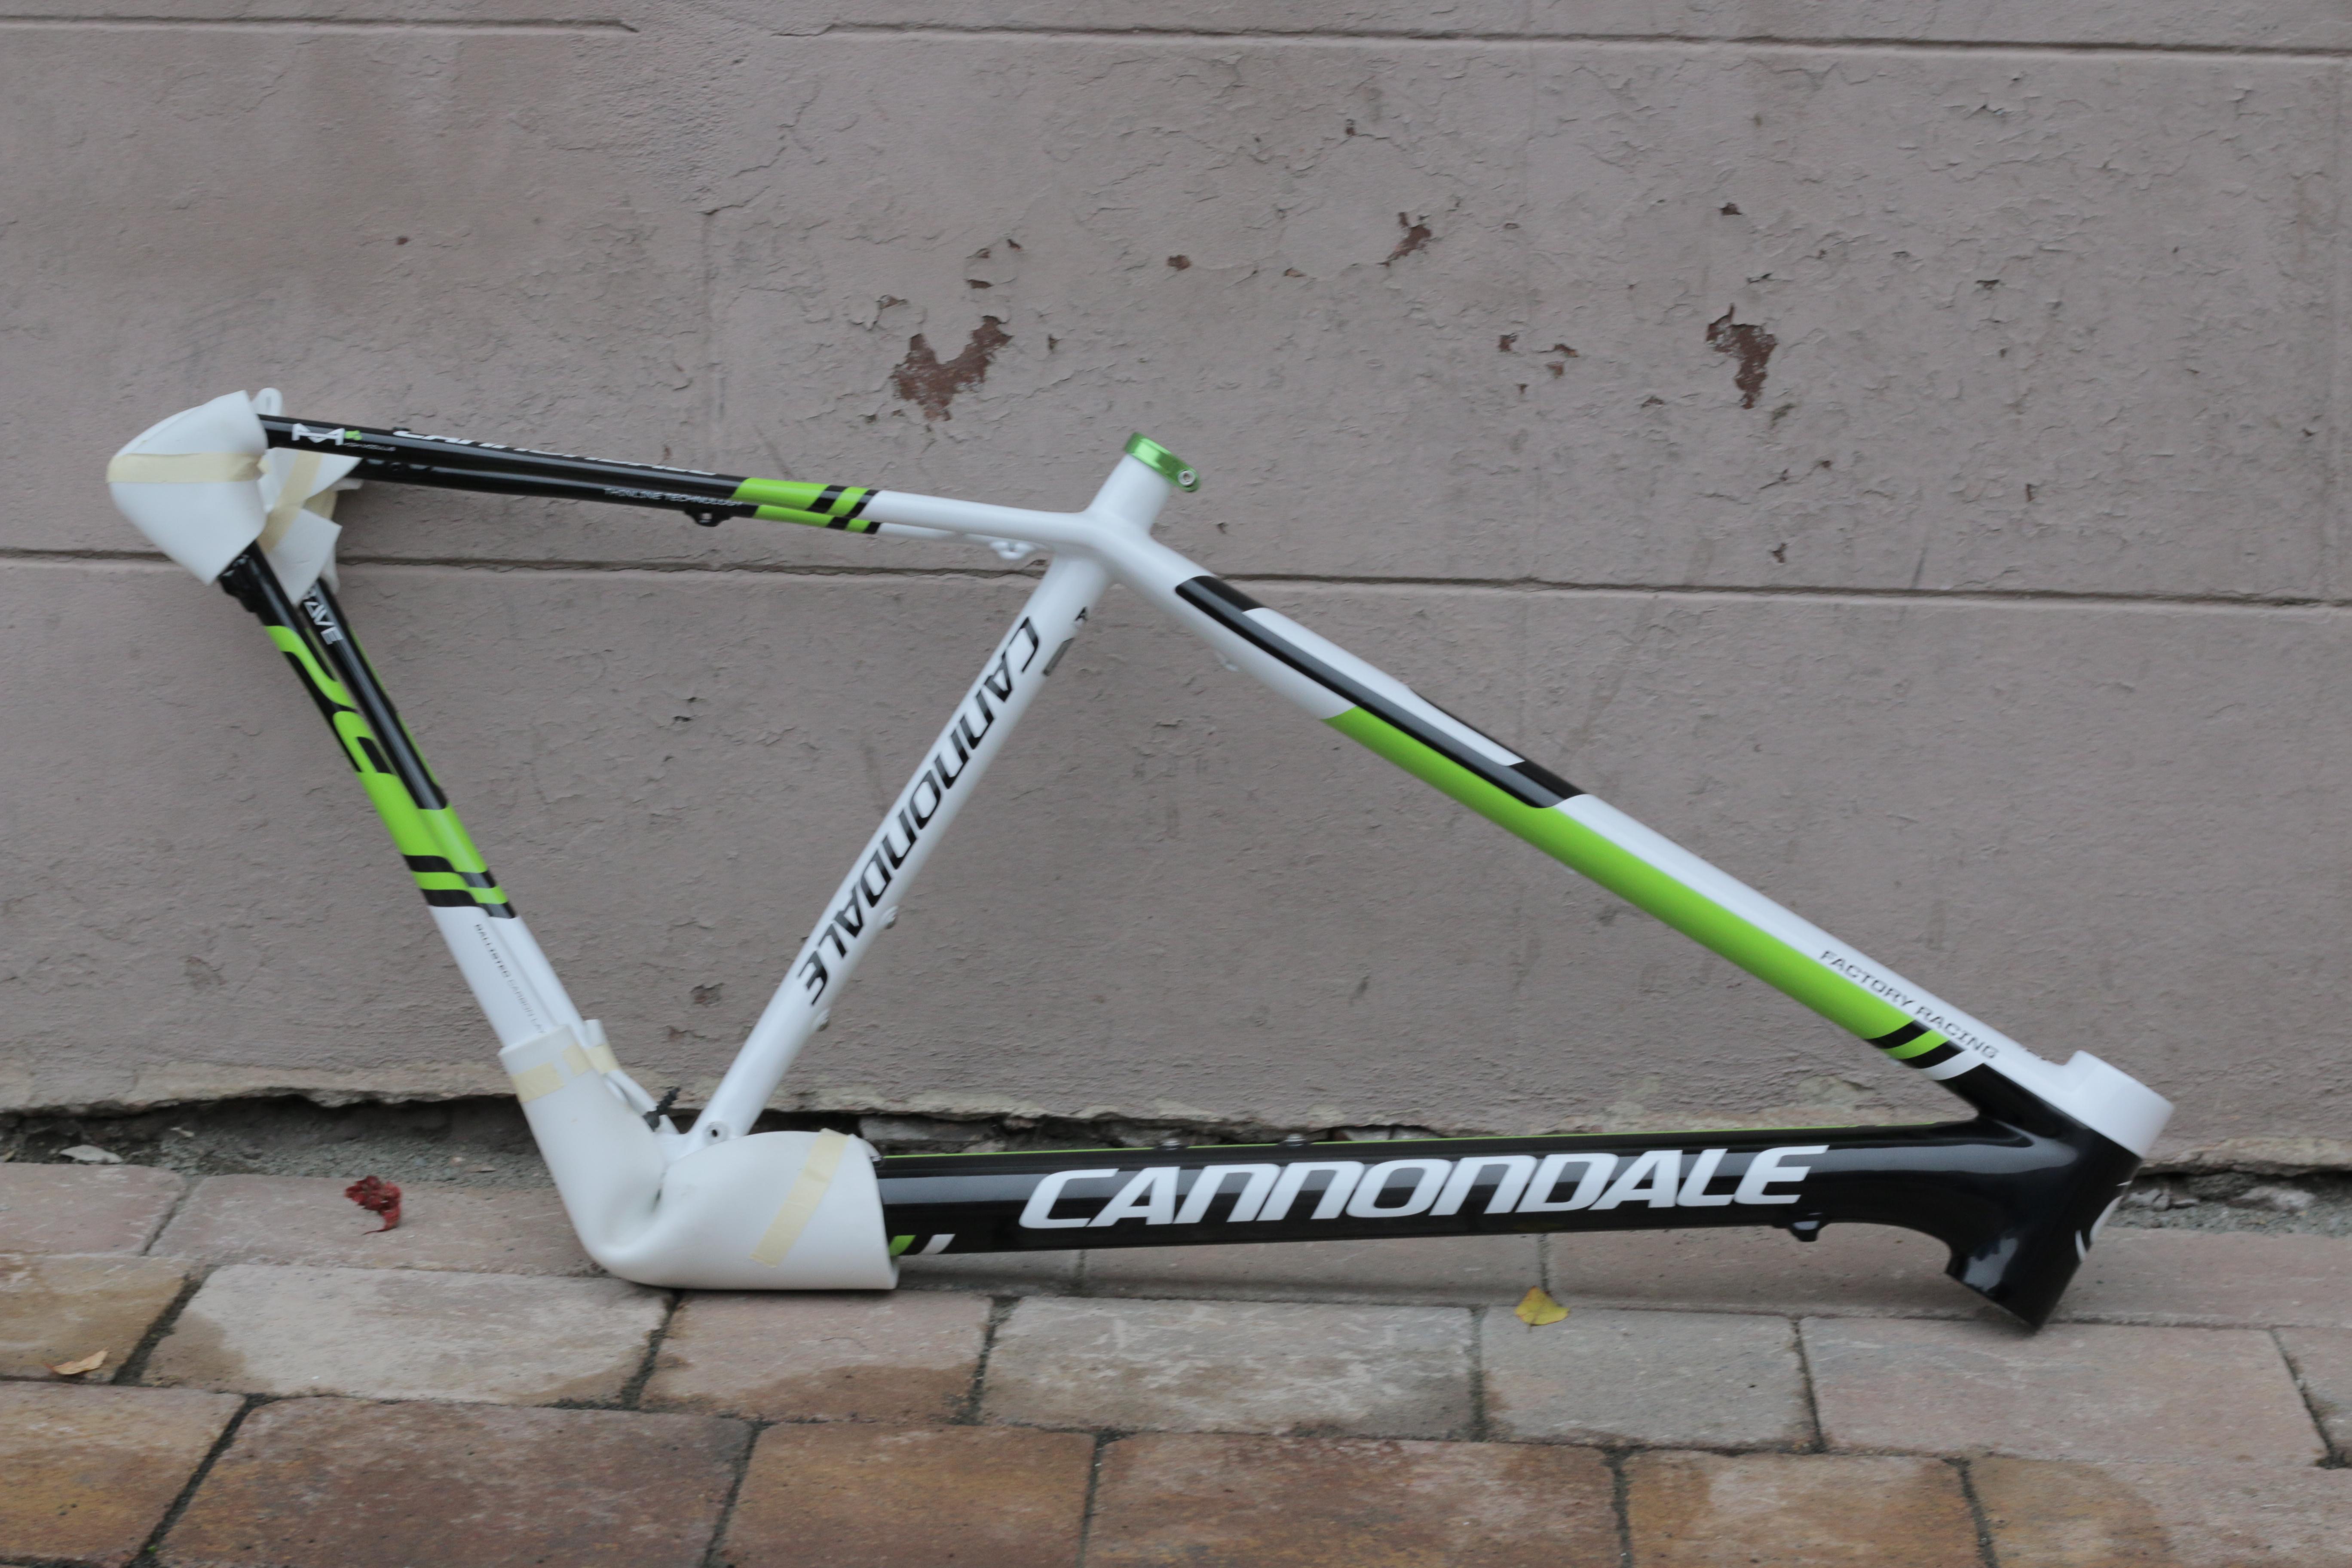 Cannondale F29 HiMod Team Rahmen | günstig online kaufen